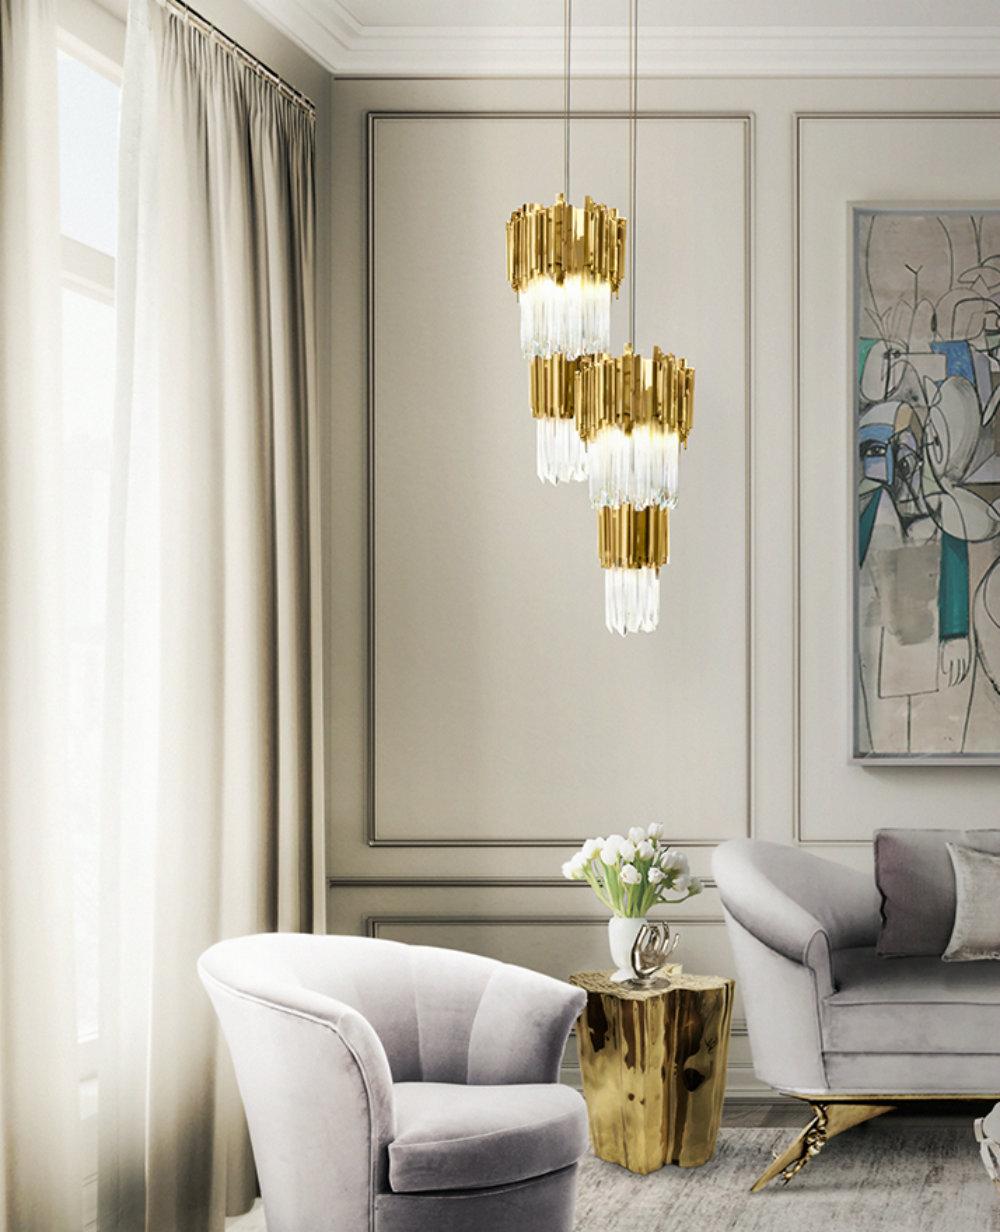 Create An Ideal Lighting Arrangement With Tom Dixon's Tips